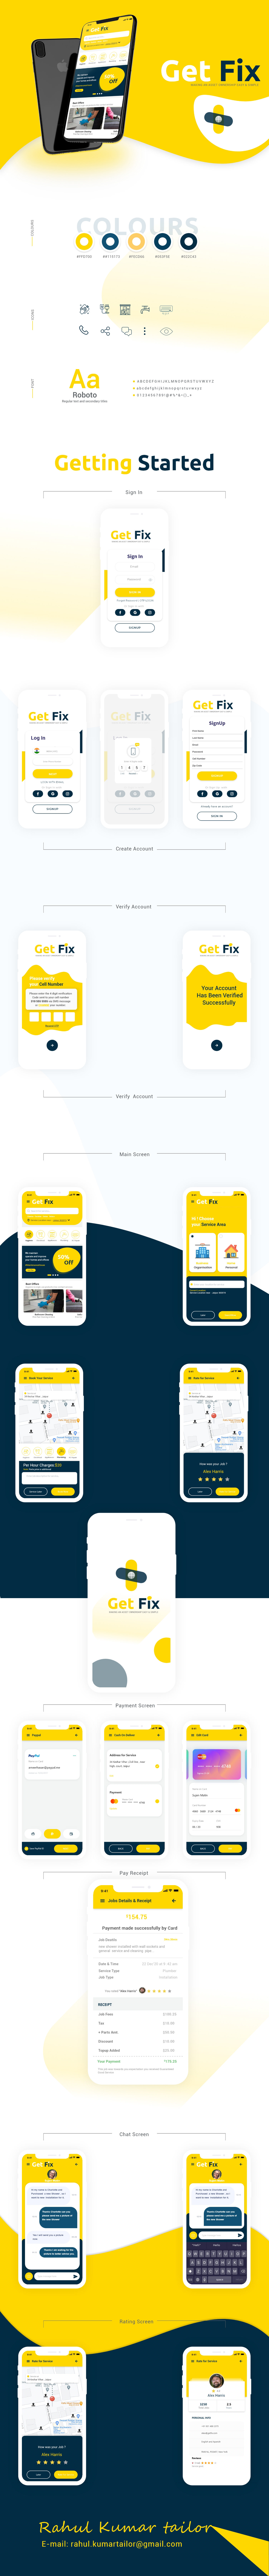 maintenance pulimber service app design Maintenance Template online Maintenance App